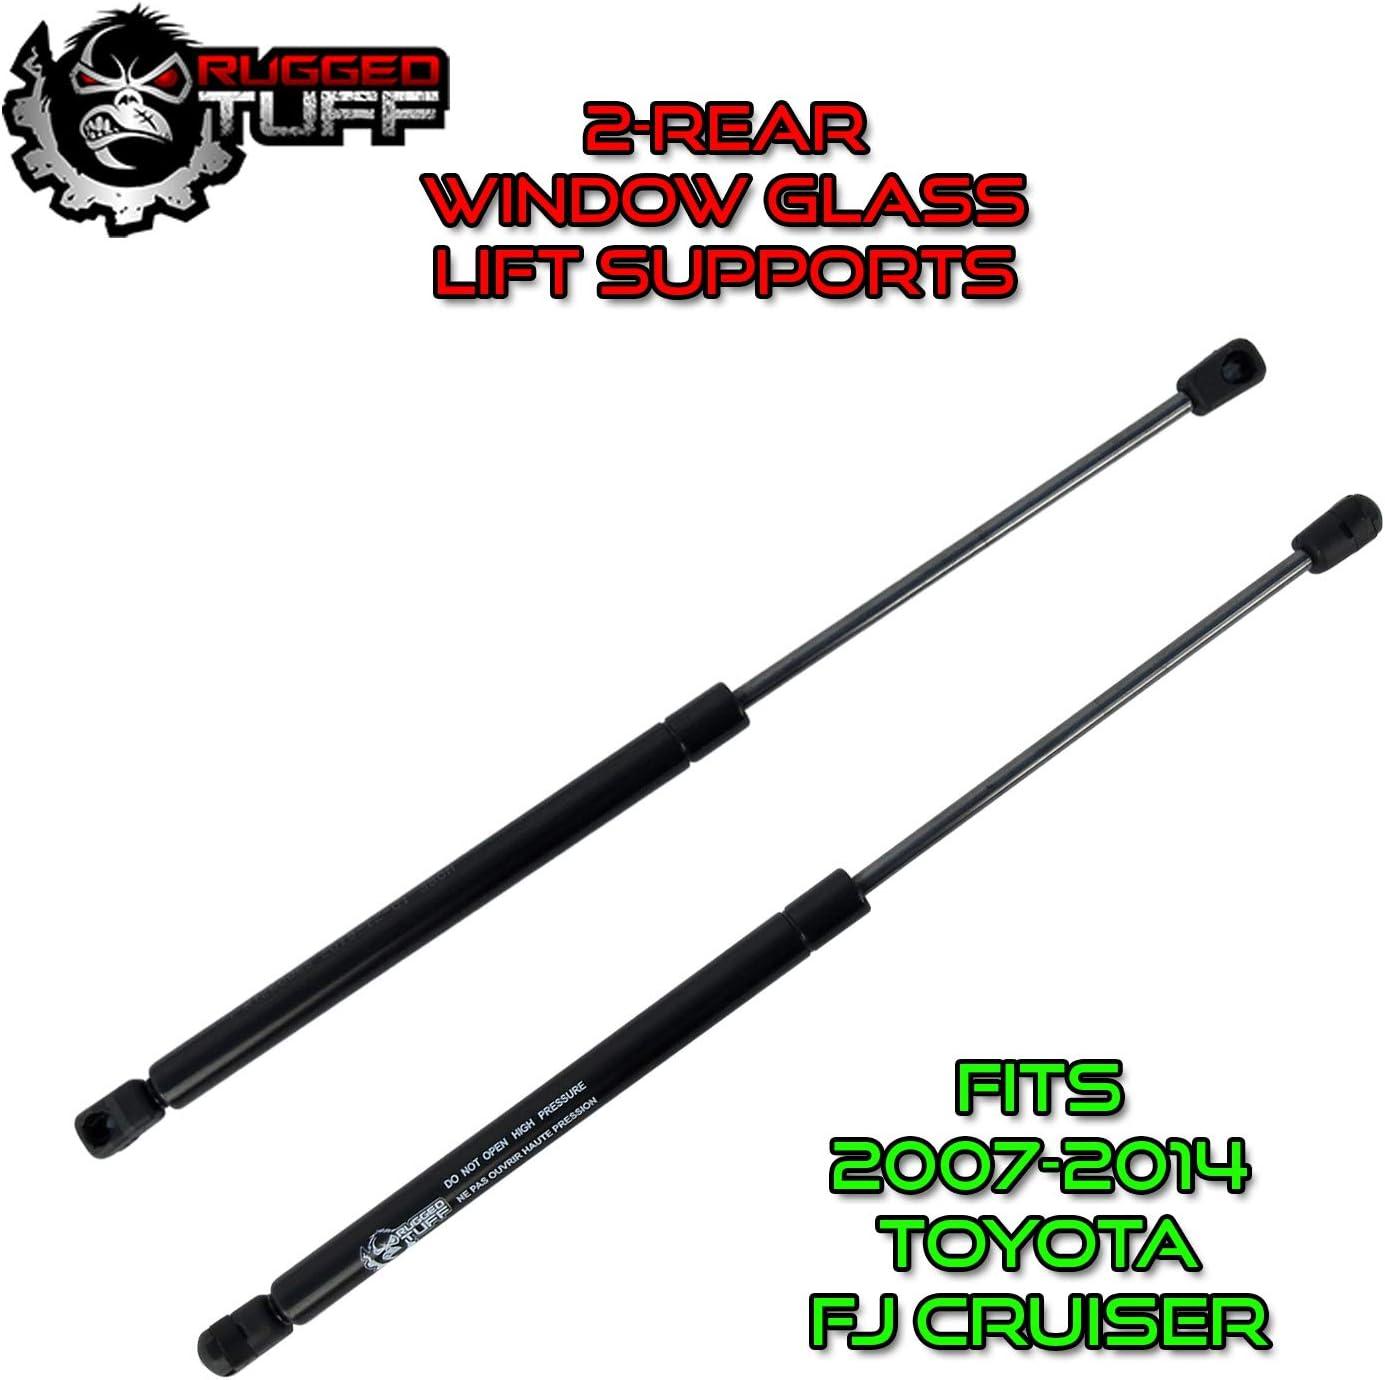 1 New Rear Window Glass Gas Lift Support Strut Prop Rod Shock Toyota FJ Cruiser